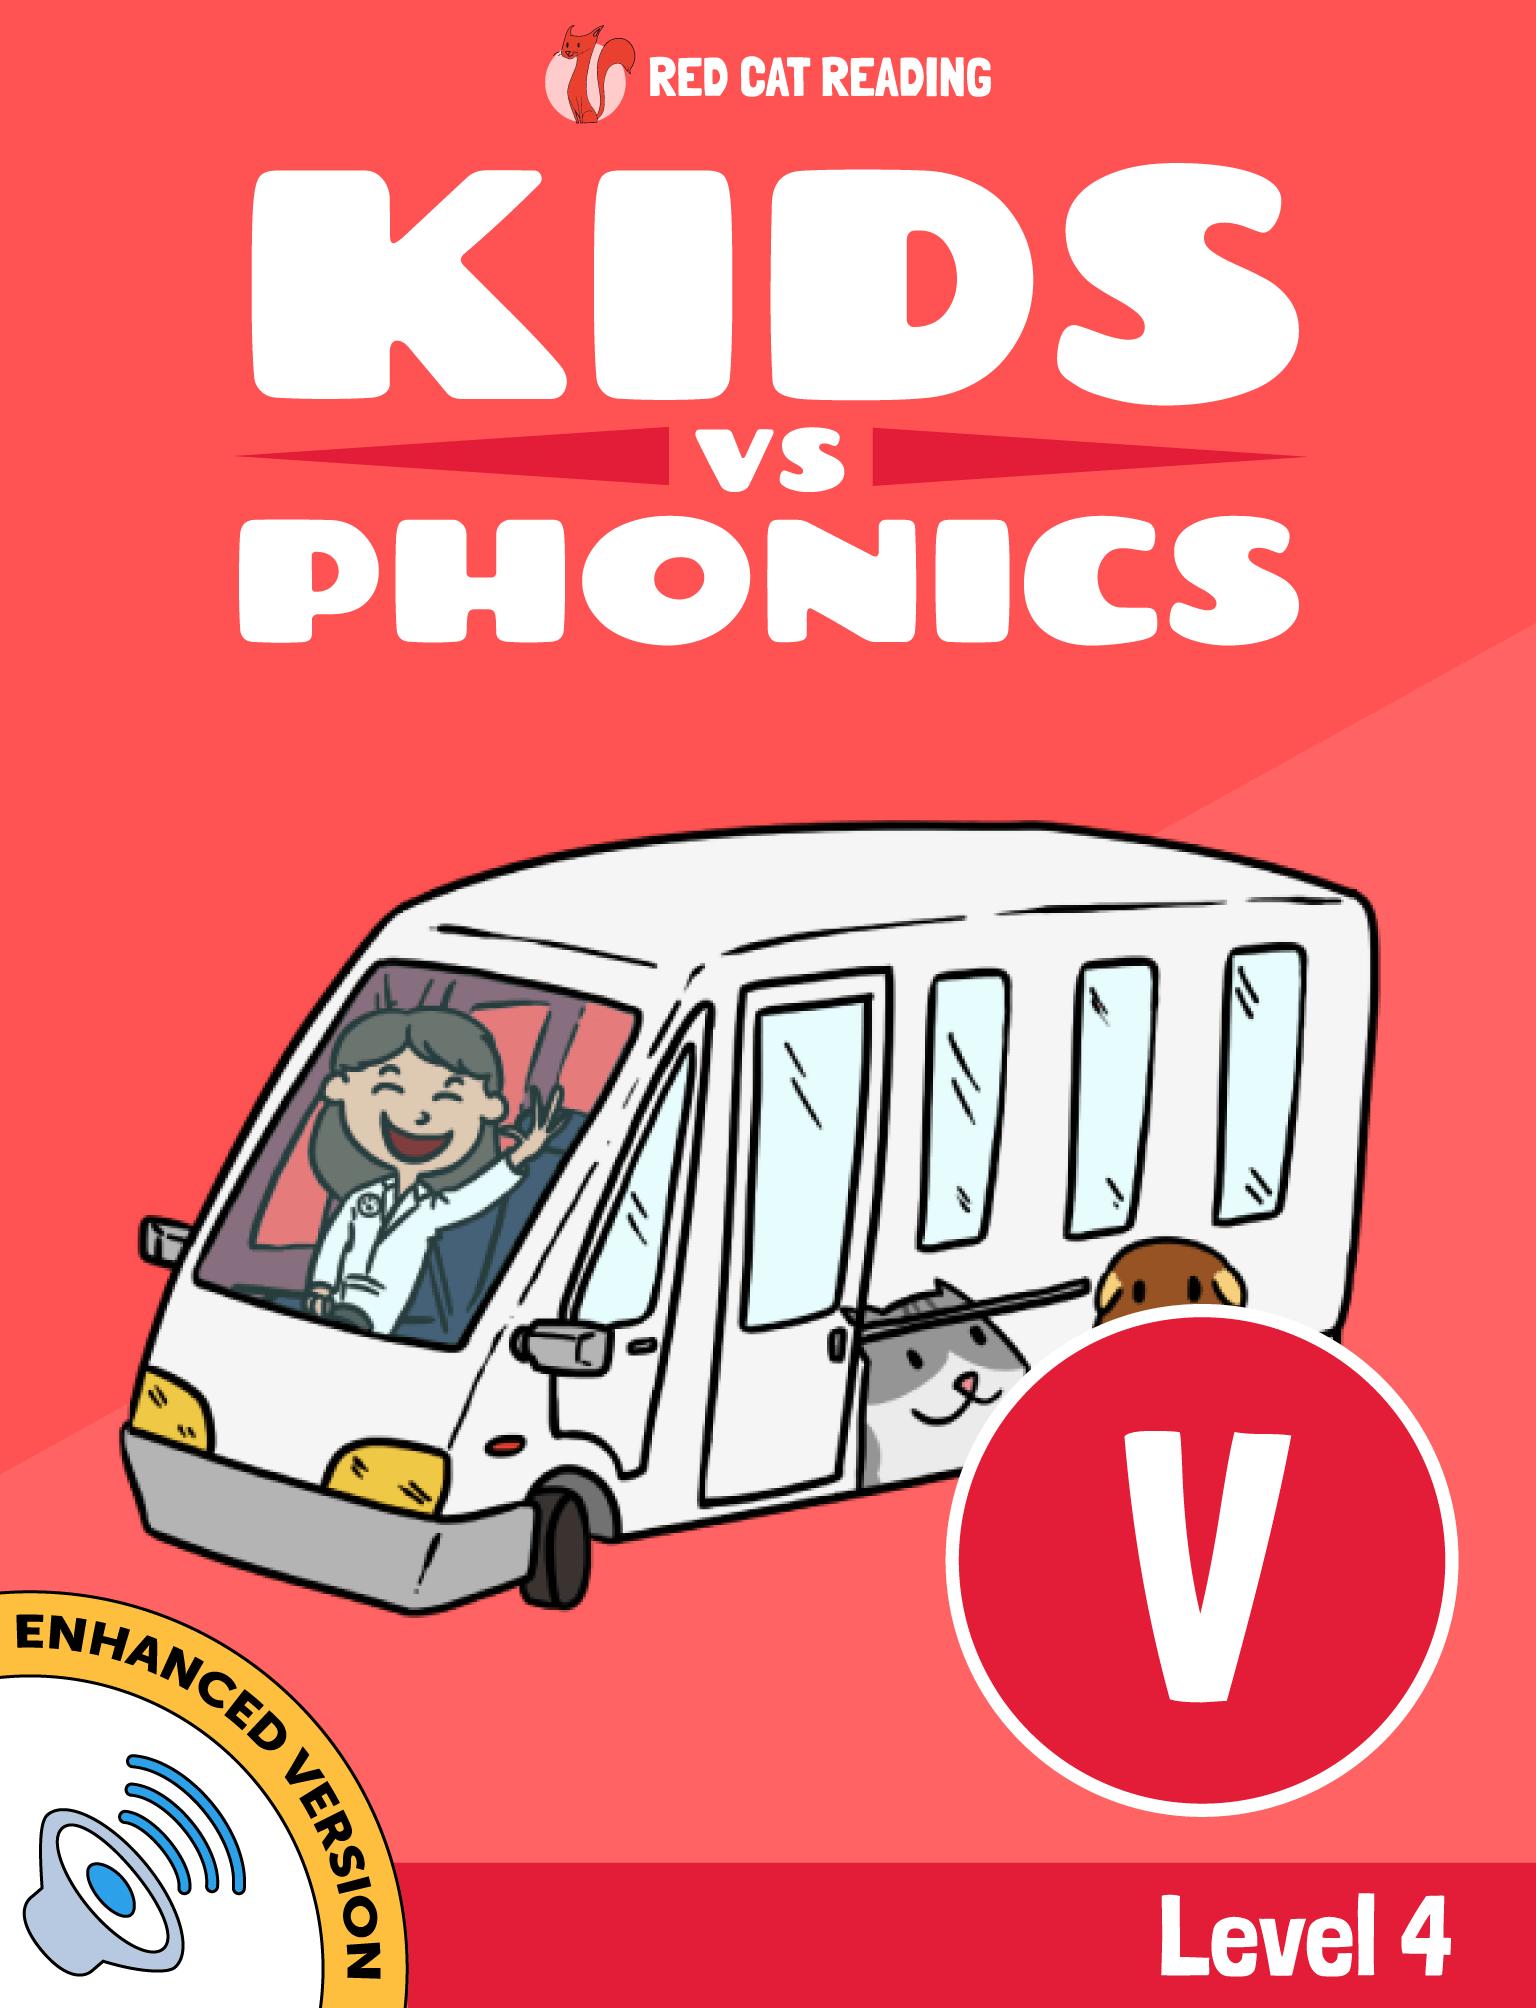 Red Cat Reading Kids vs Phonics Level 4 Phonics V Sound